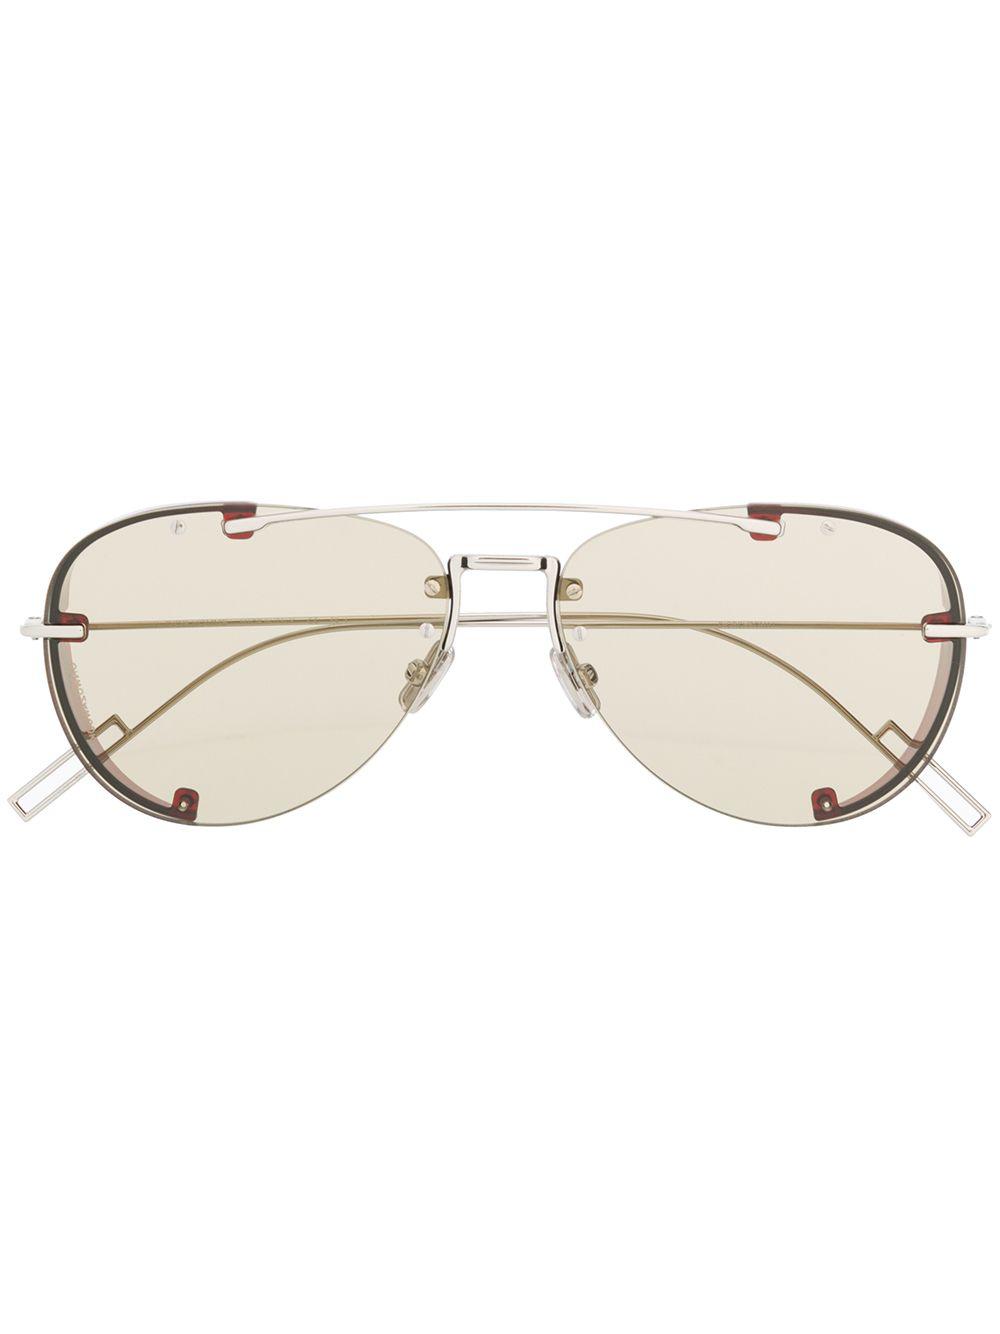 4d4c1e9ce7a7 Dior Eyewear Chroma1 Sunglasses - Silver   ModeSens